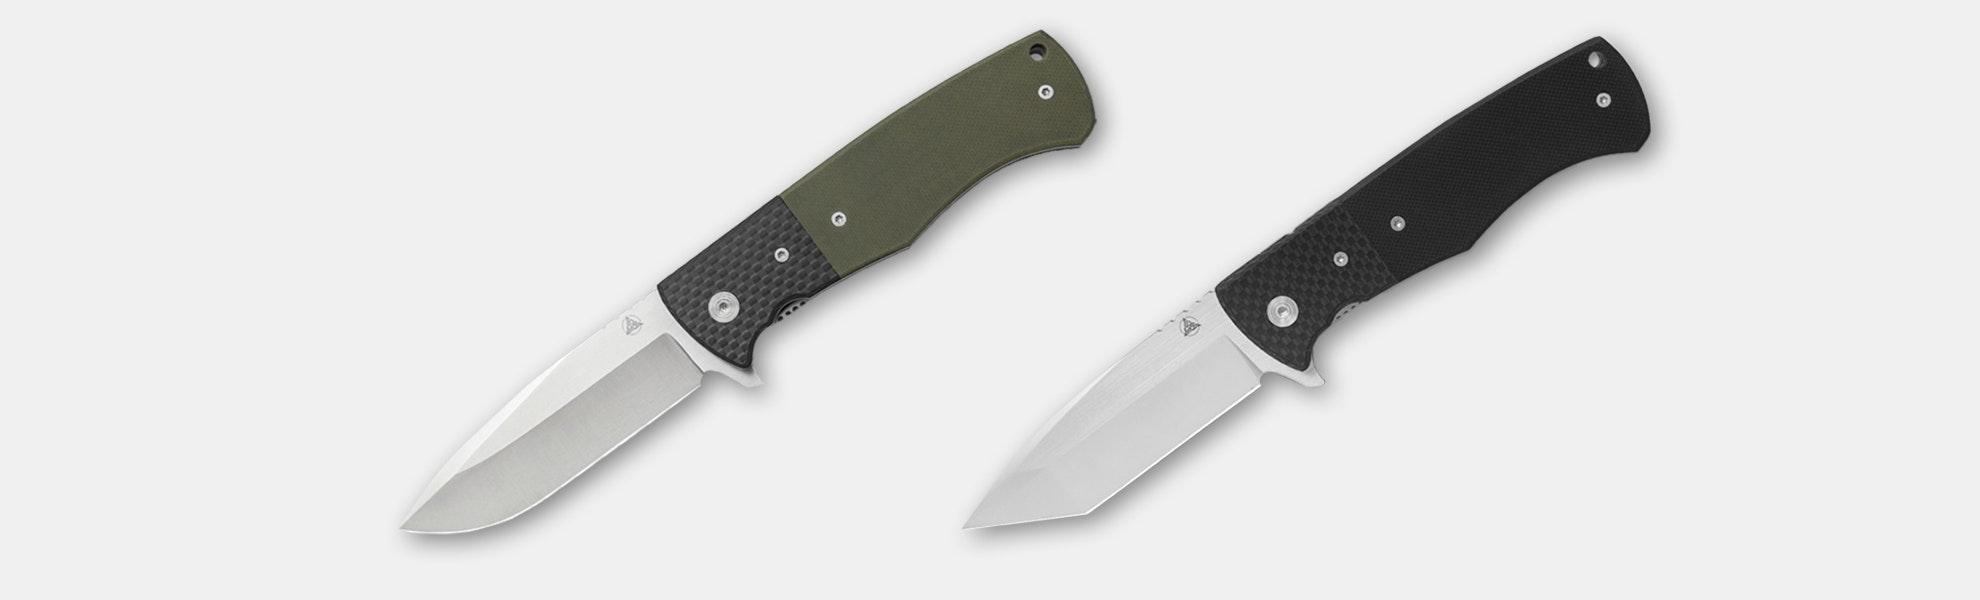 Nemesis Mar Private Reserve VG-10 Knives